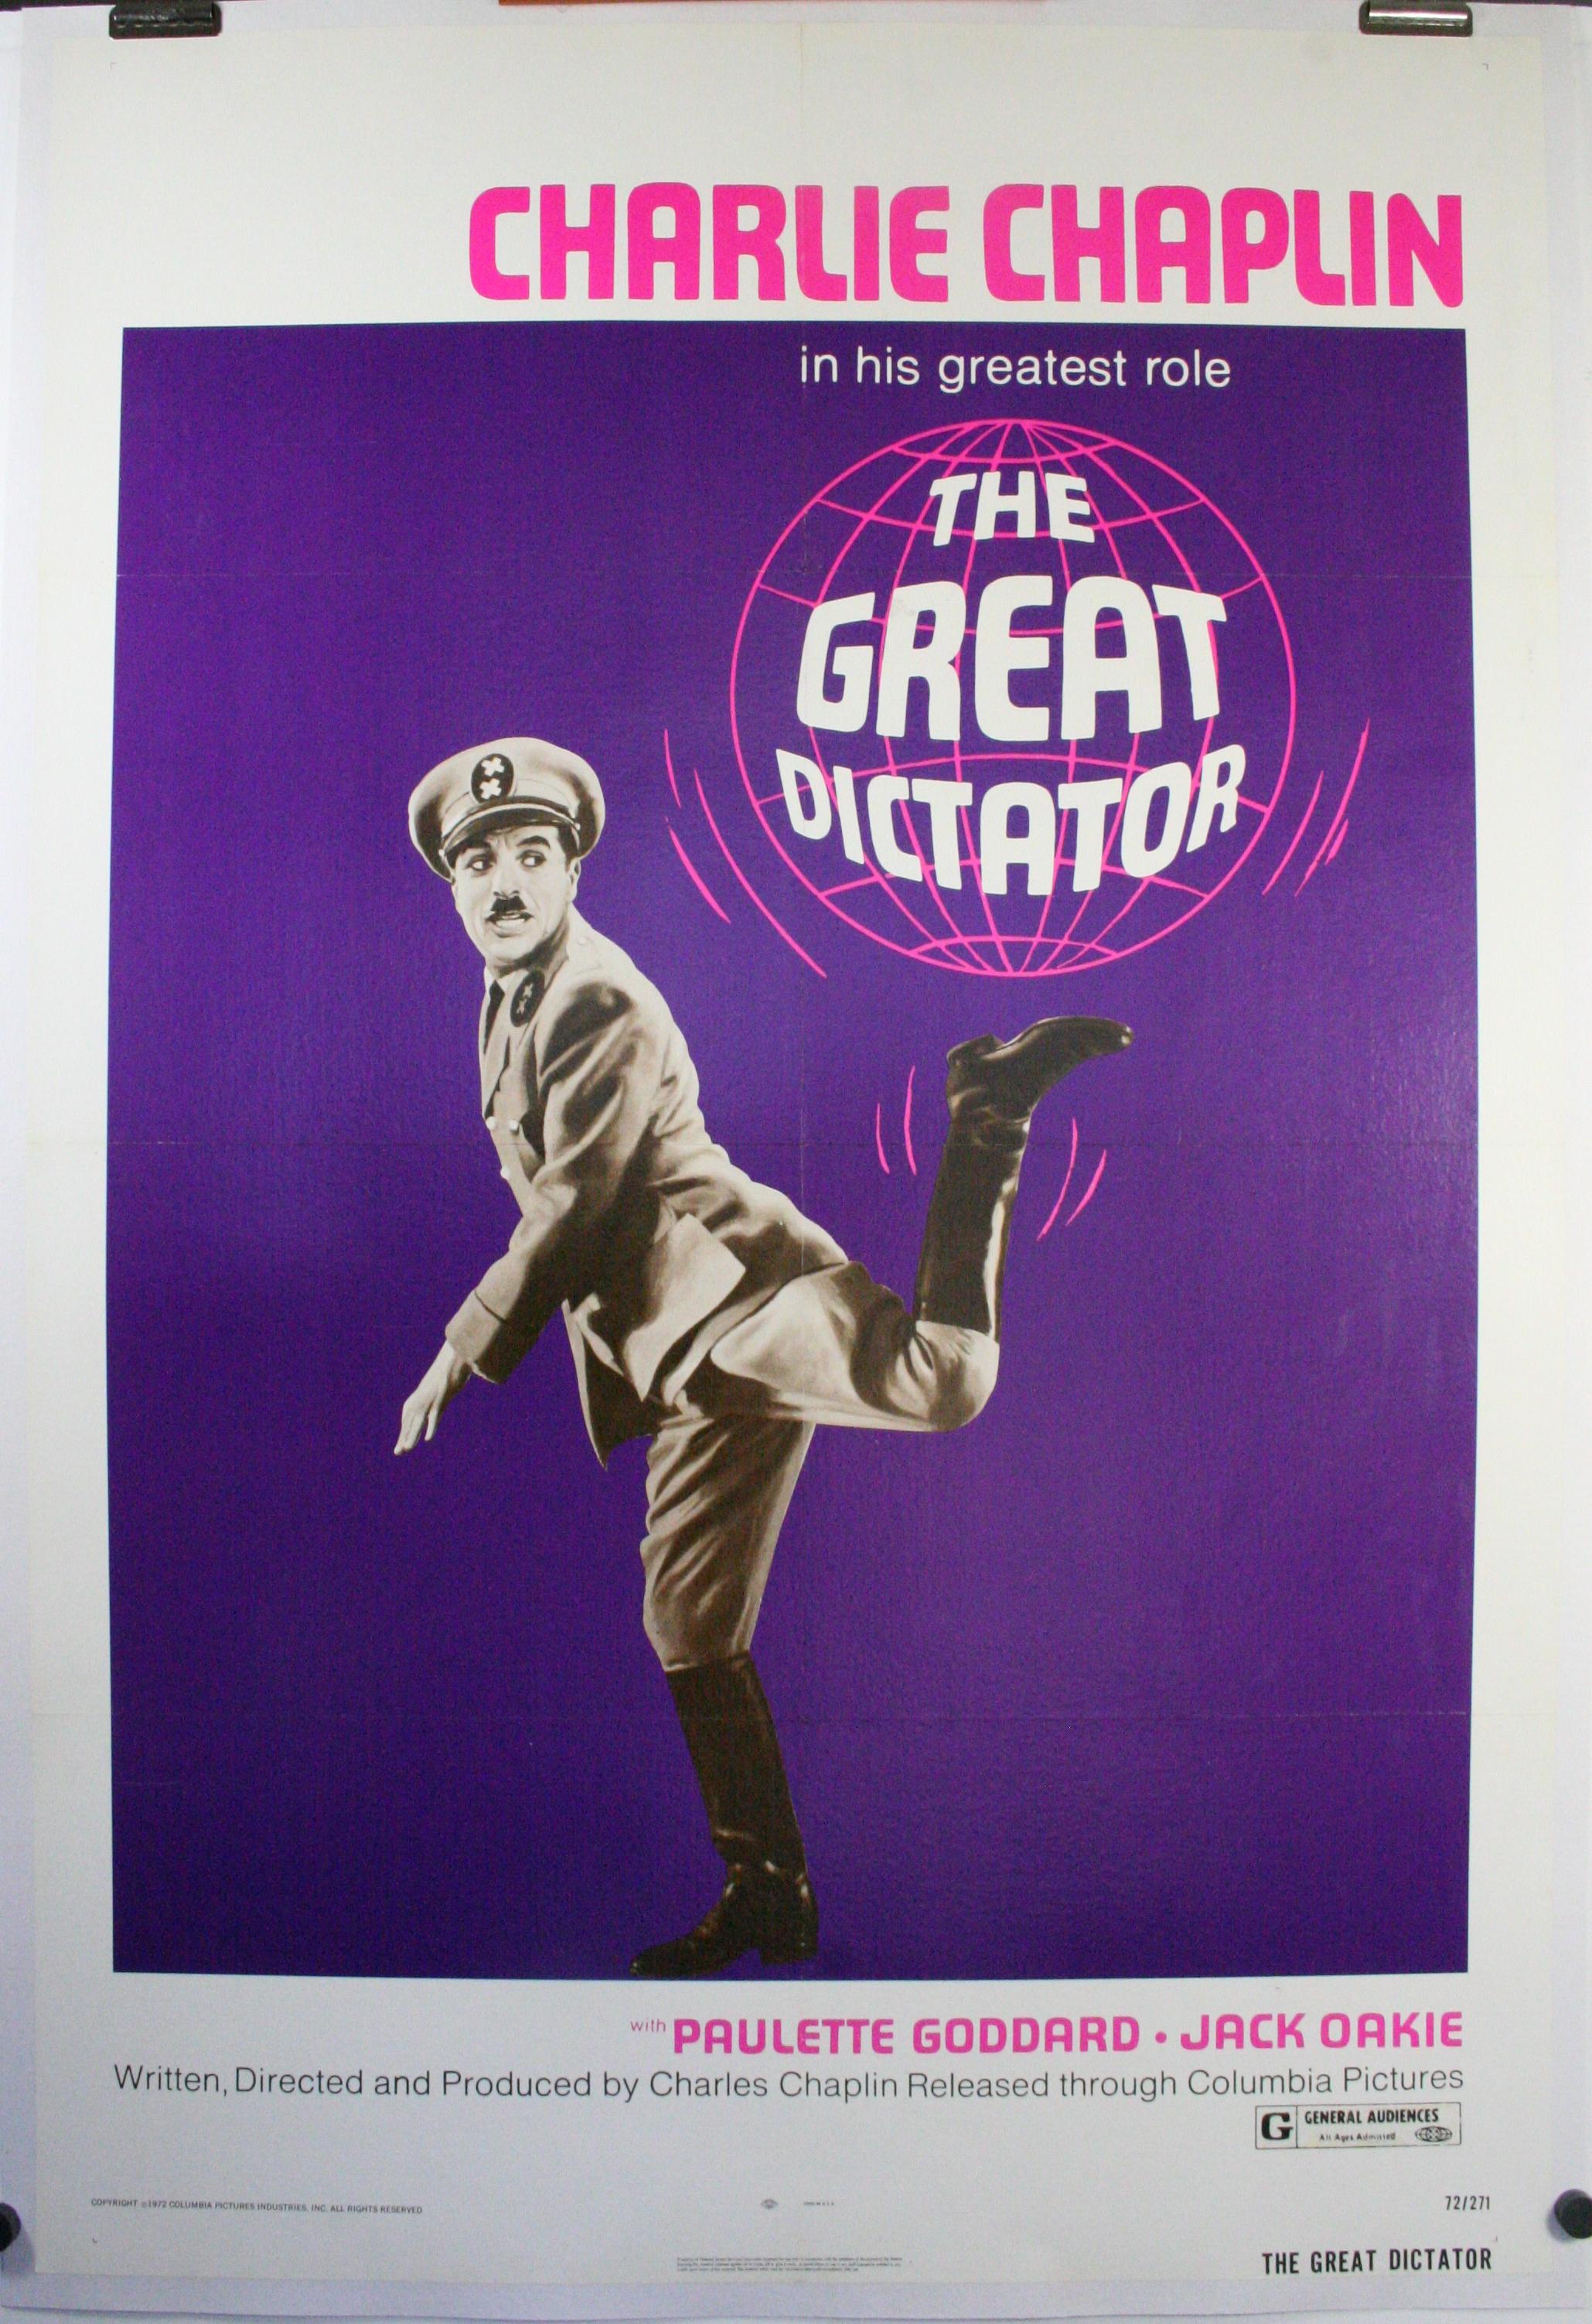 GREAT DICTATOR, Original Charlie Chaplin Movie Poster